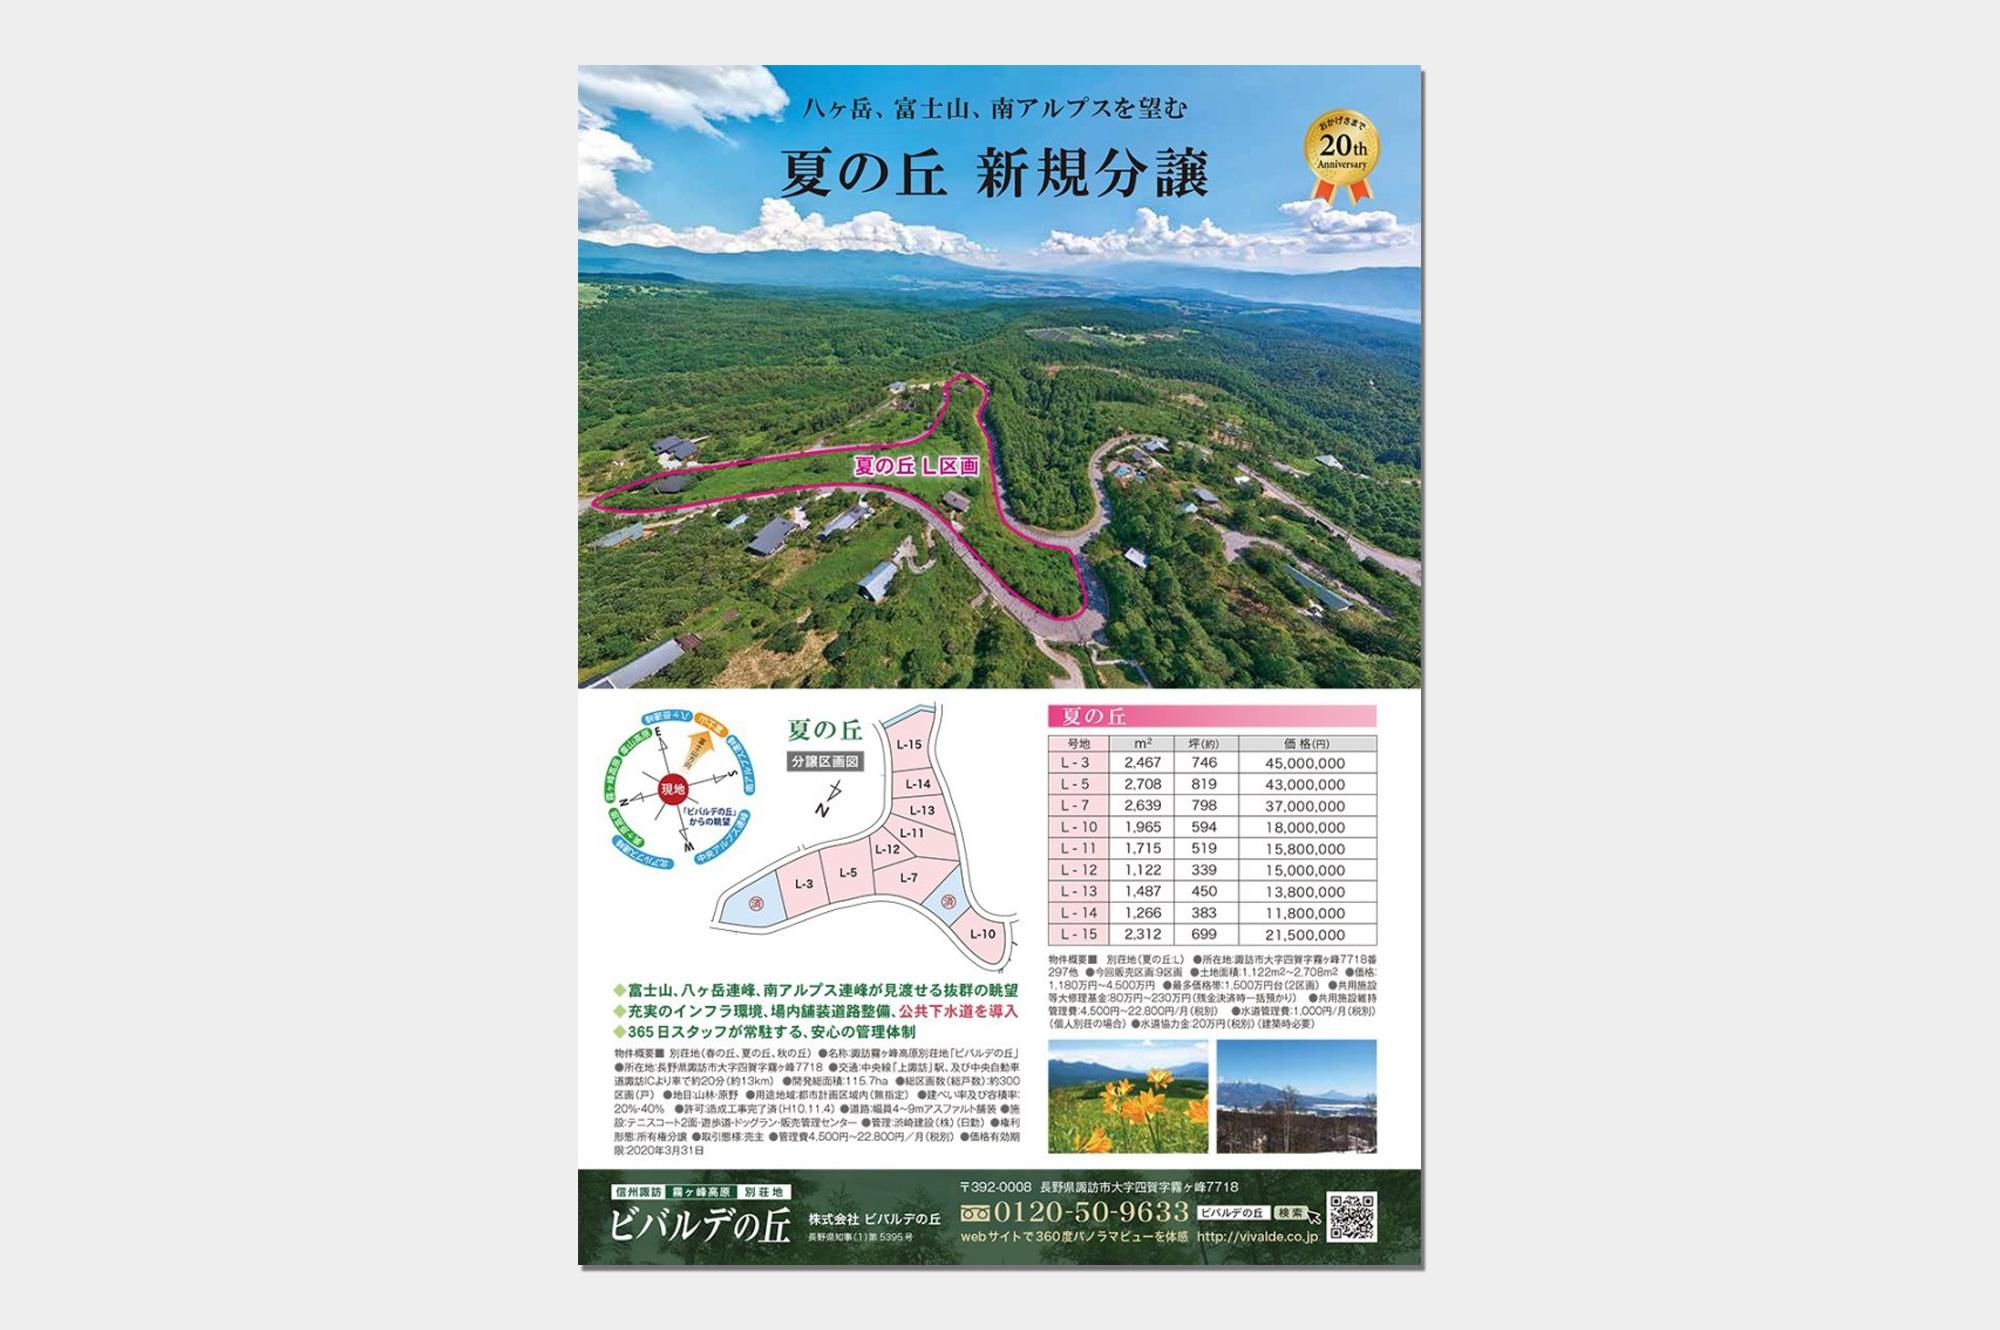 A4リーフレット(別荘地新規分譲開始)